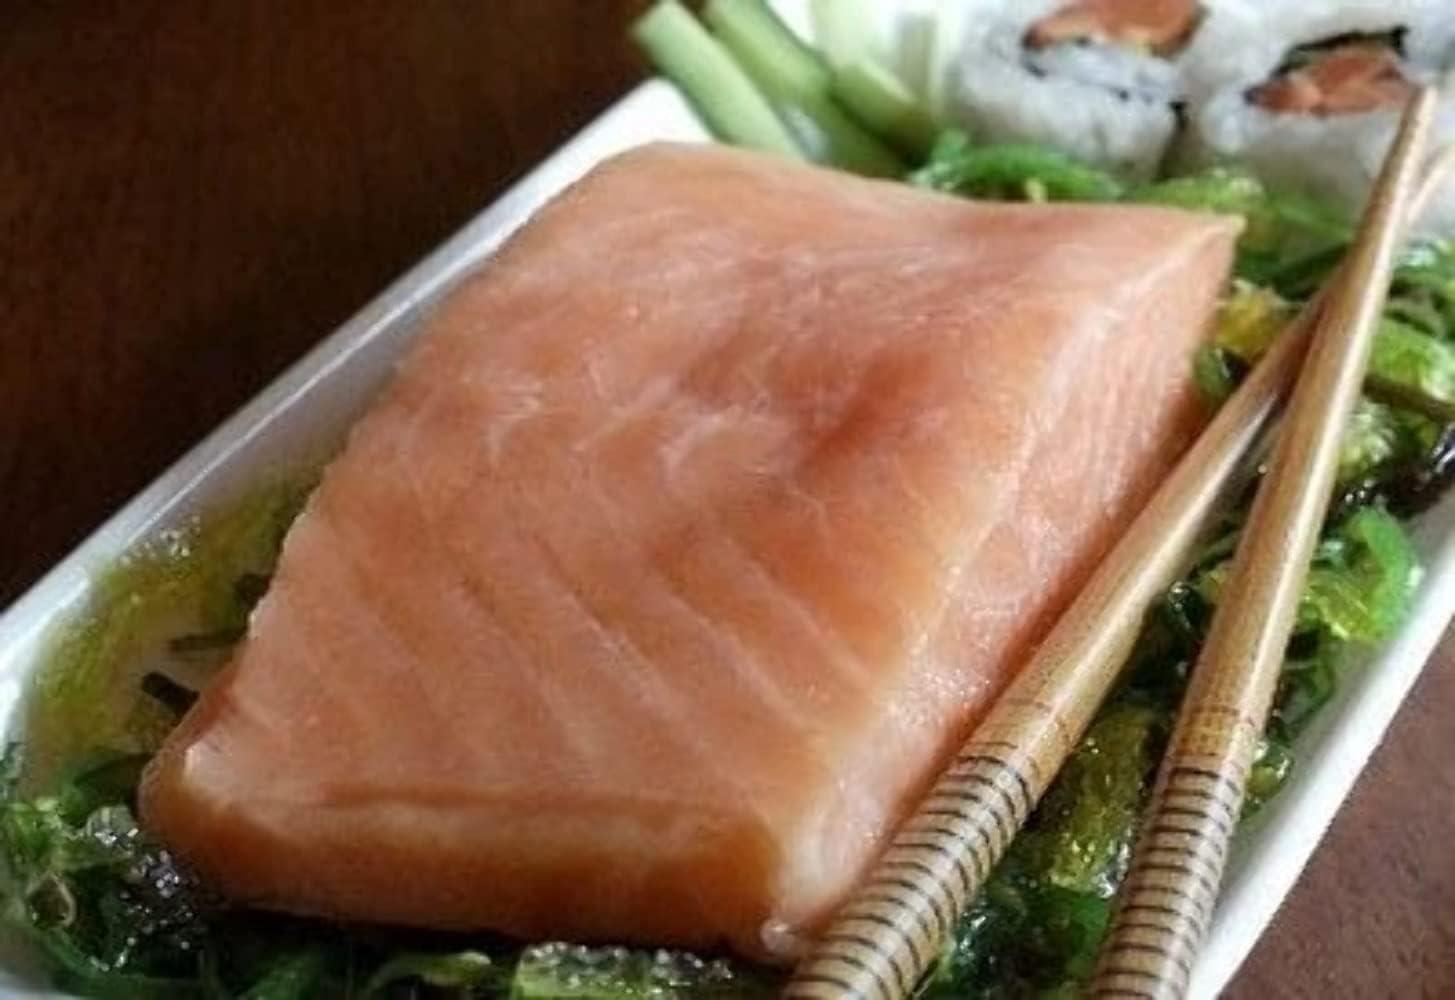 Norwegian Salmon 8 oz. Center Cuts 5 lbs. (10 Pcs.)